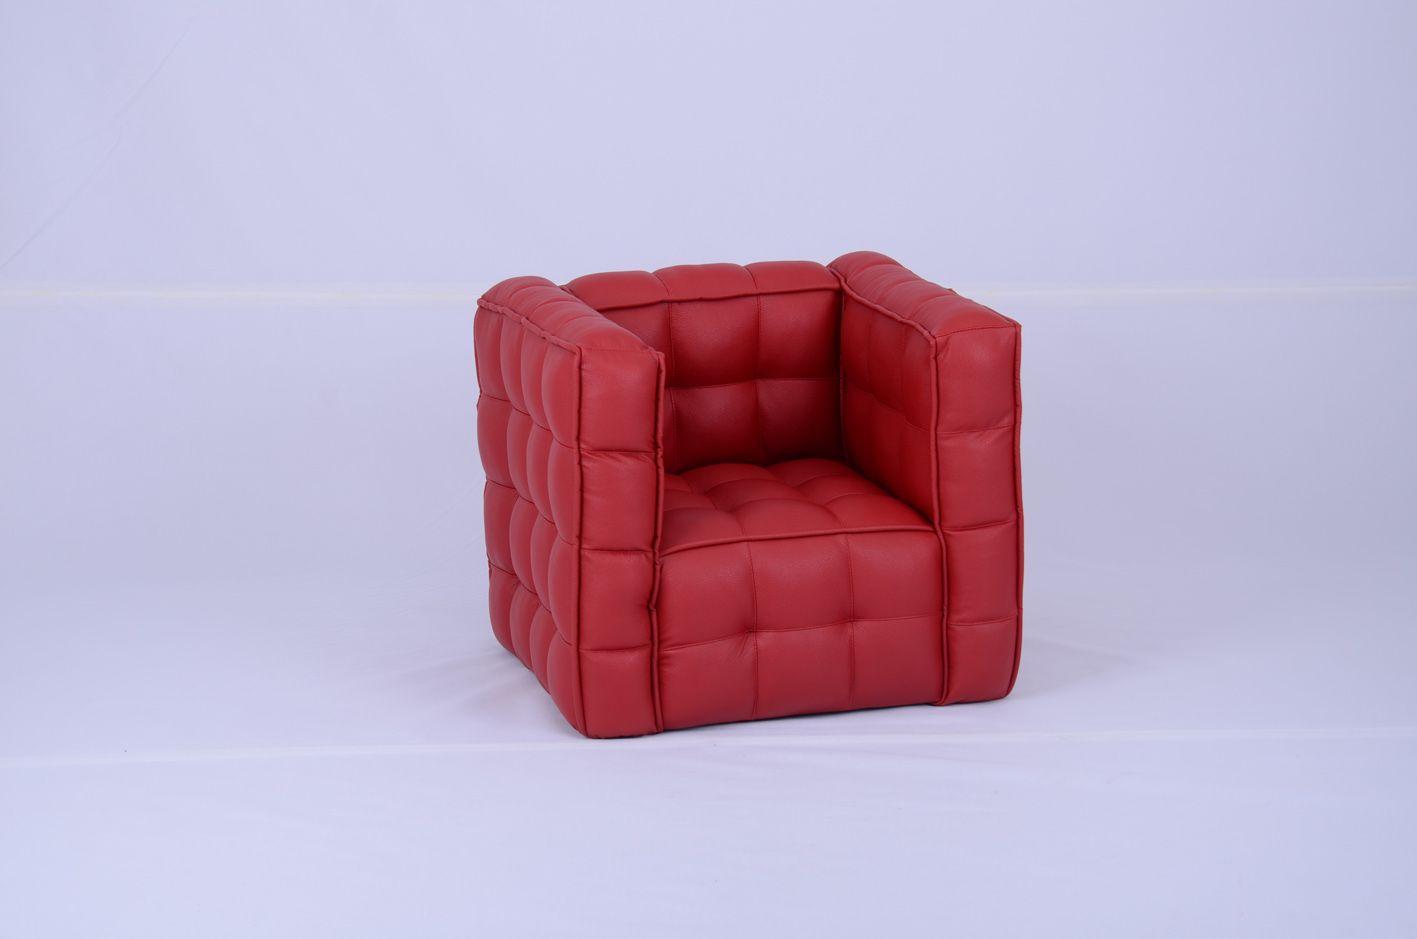 Sleeper Sofas Corner Luxury Children Sofa Chair Kids Furniture SXBB efull